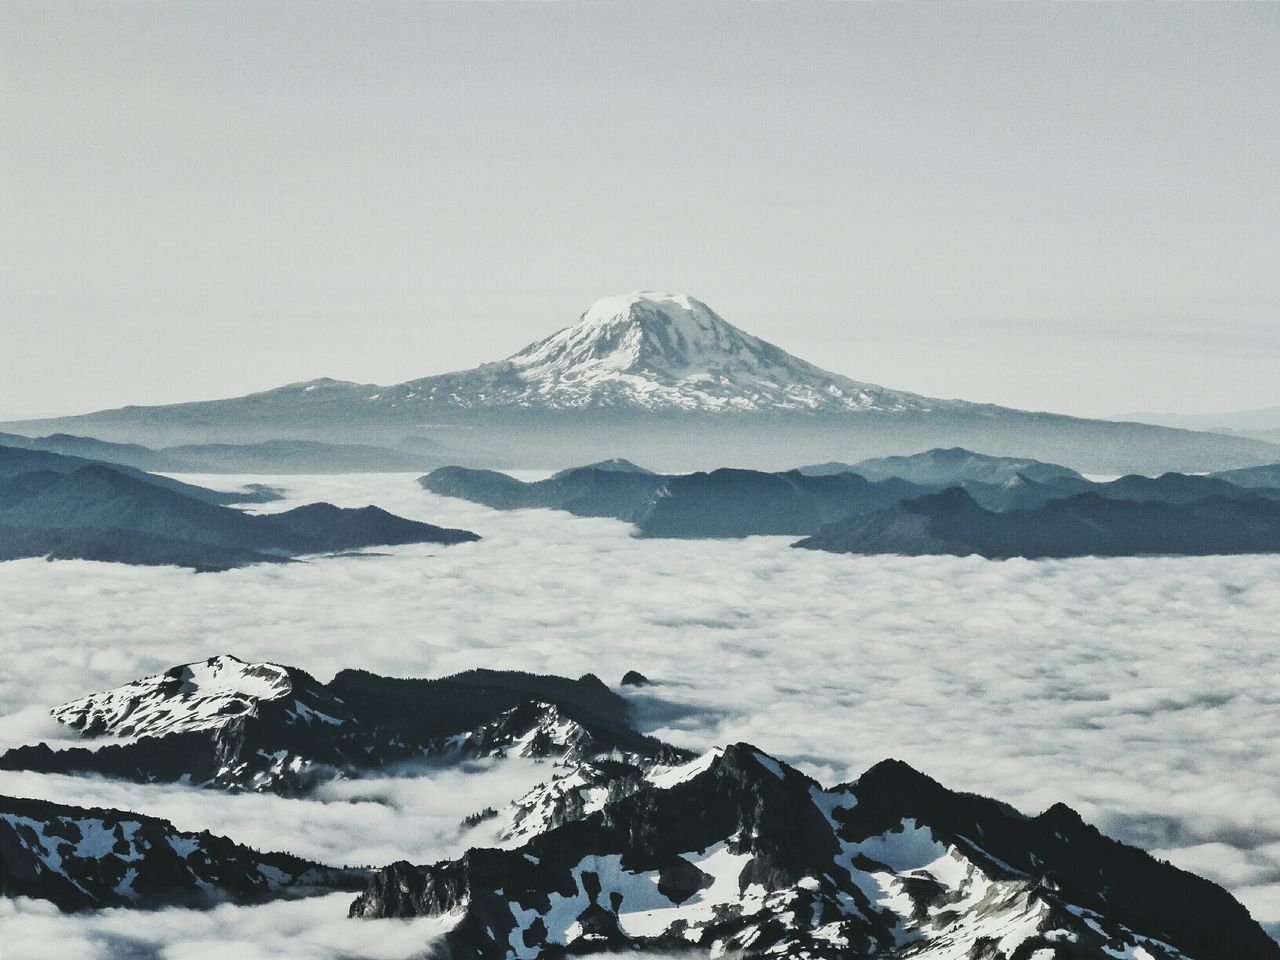 Scenic shot of calm sea against mountain peak